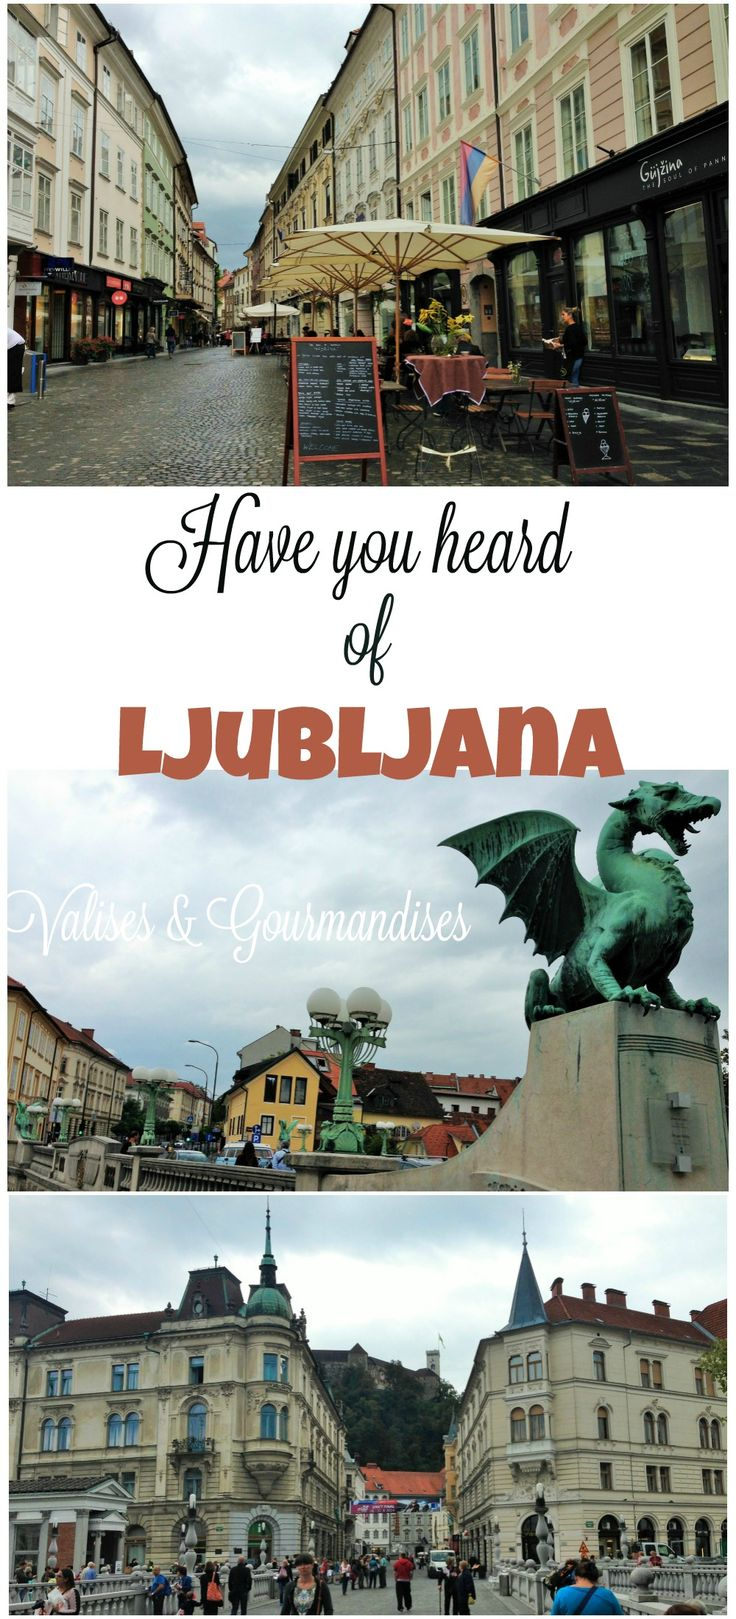 Discover Ljubljana, the excentric capital of Slovenia